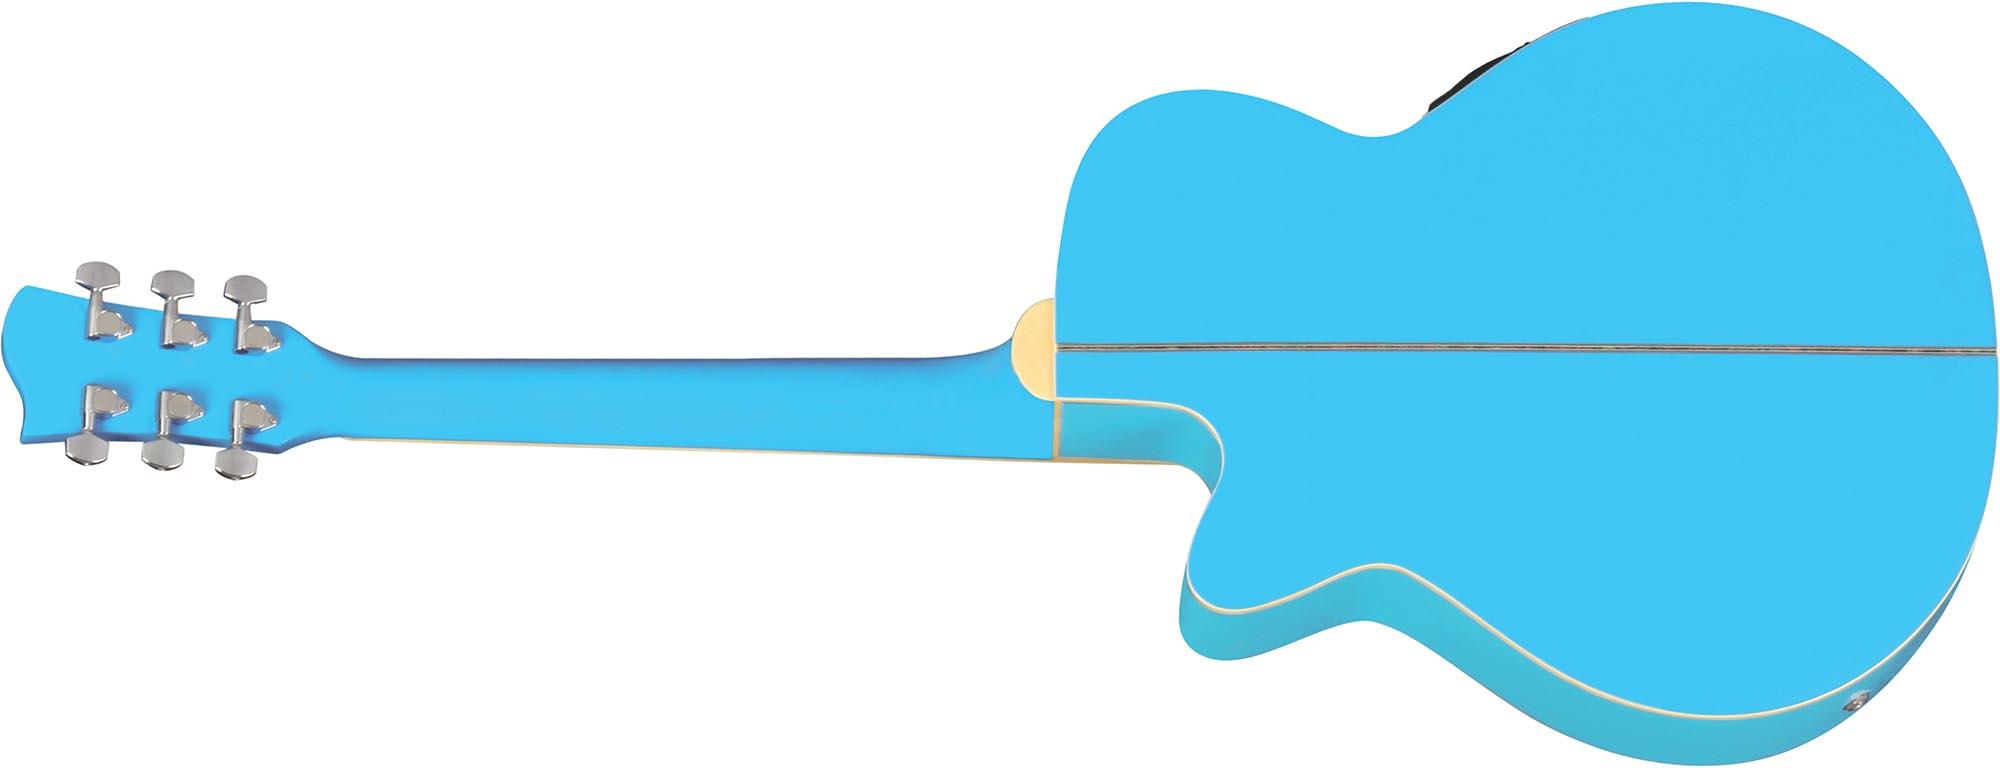 ch10 violao folk mini jumbo eletroacustico eagle pro series ch10 sbl azul visao posterior